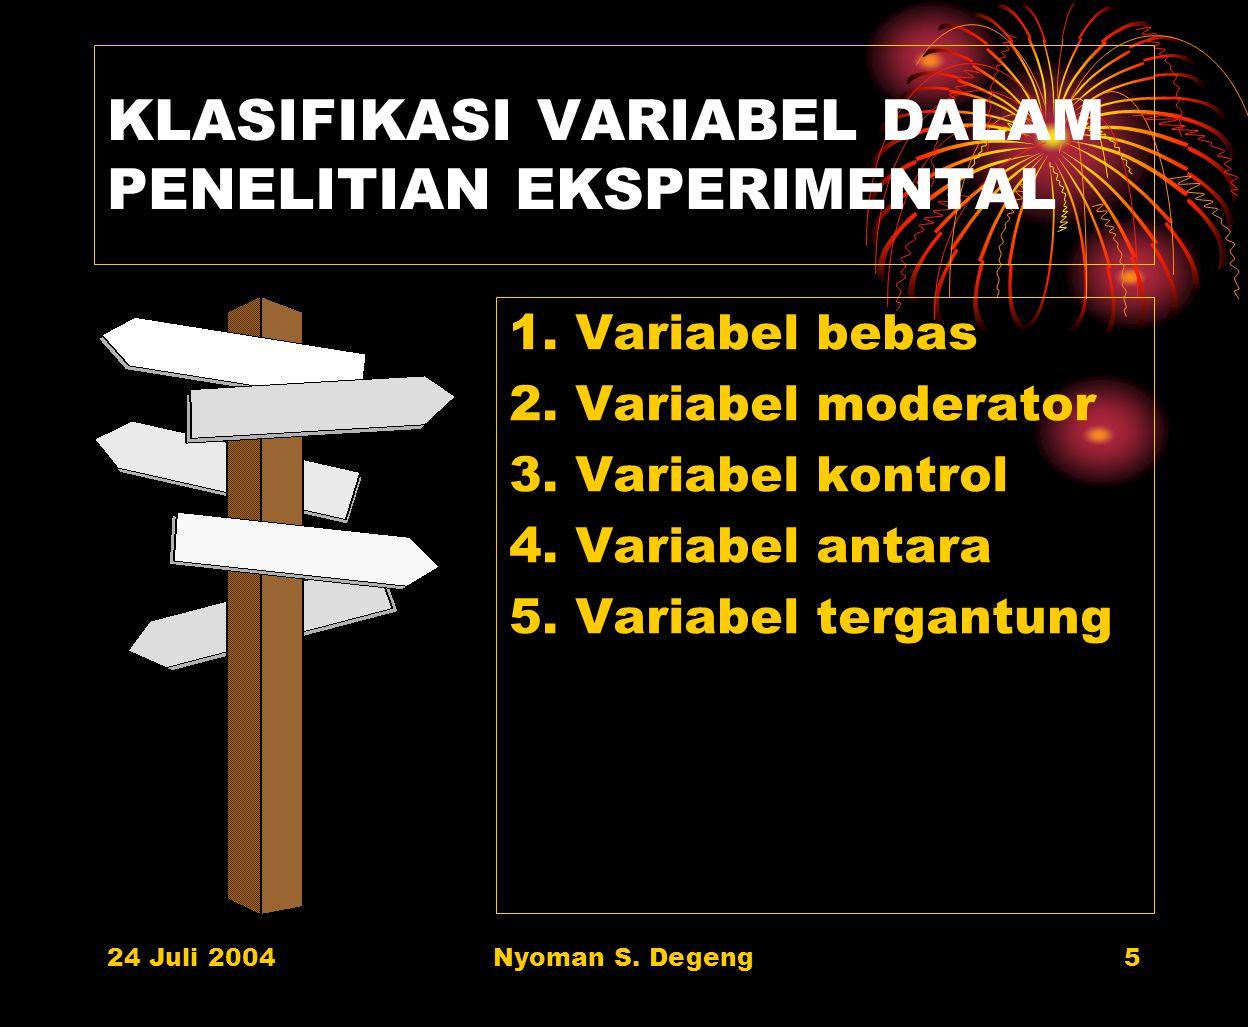 24 Juli 2004Nyoman S. Degeng4 CONTOH JUDUL PENELITIAN Variabel Penelitian: (1) Pemberian Pekerjaan Rumah (2) Hasil Belajar Matematika Jenis Hubungan A